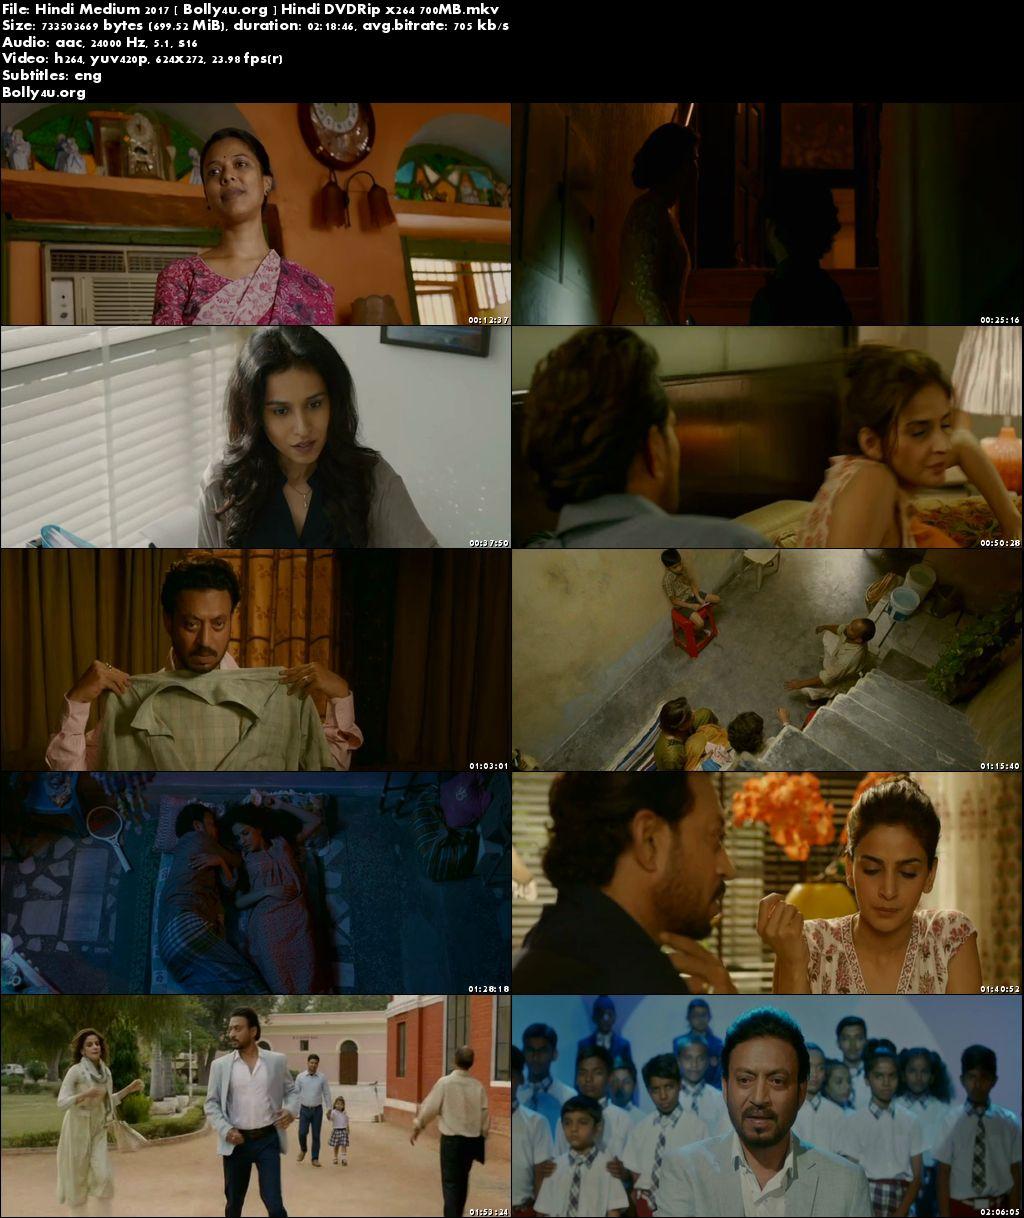 Hindi Medium 2017 DVDRip 400MB Full Hindi Movie Download 480p